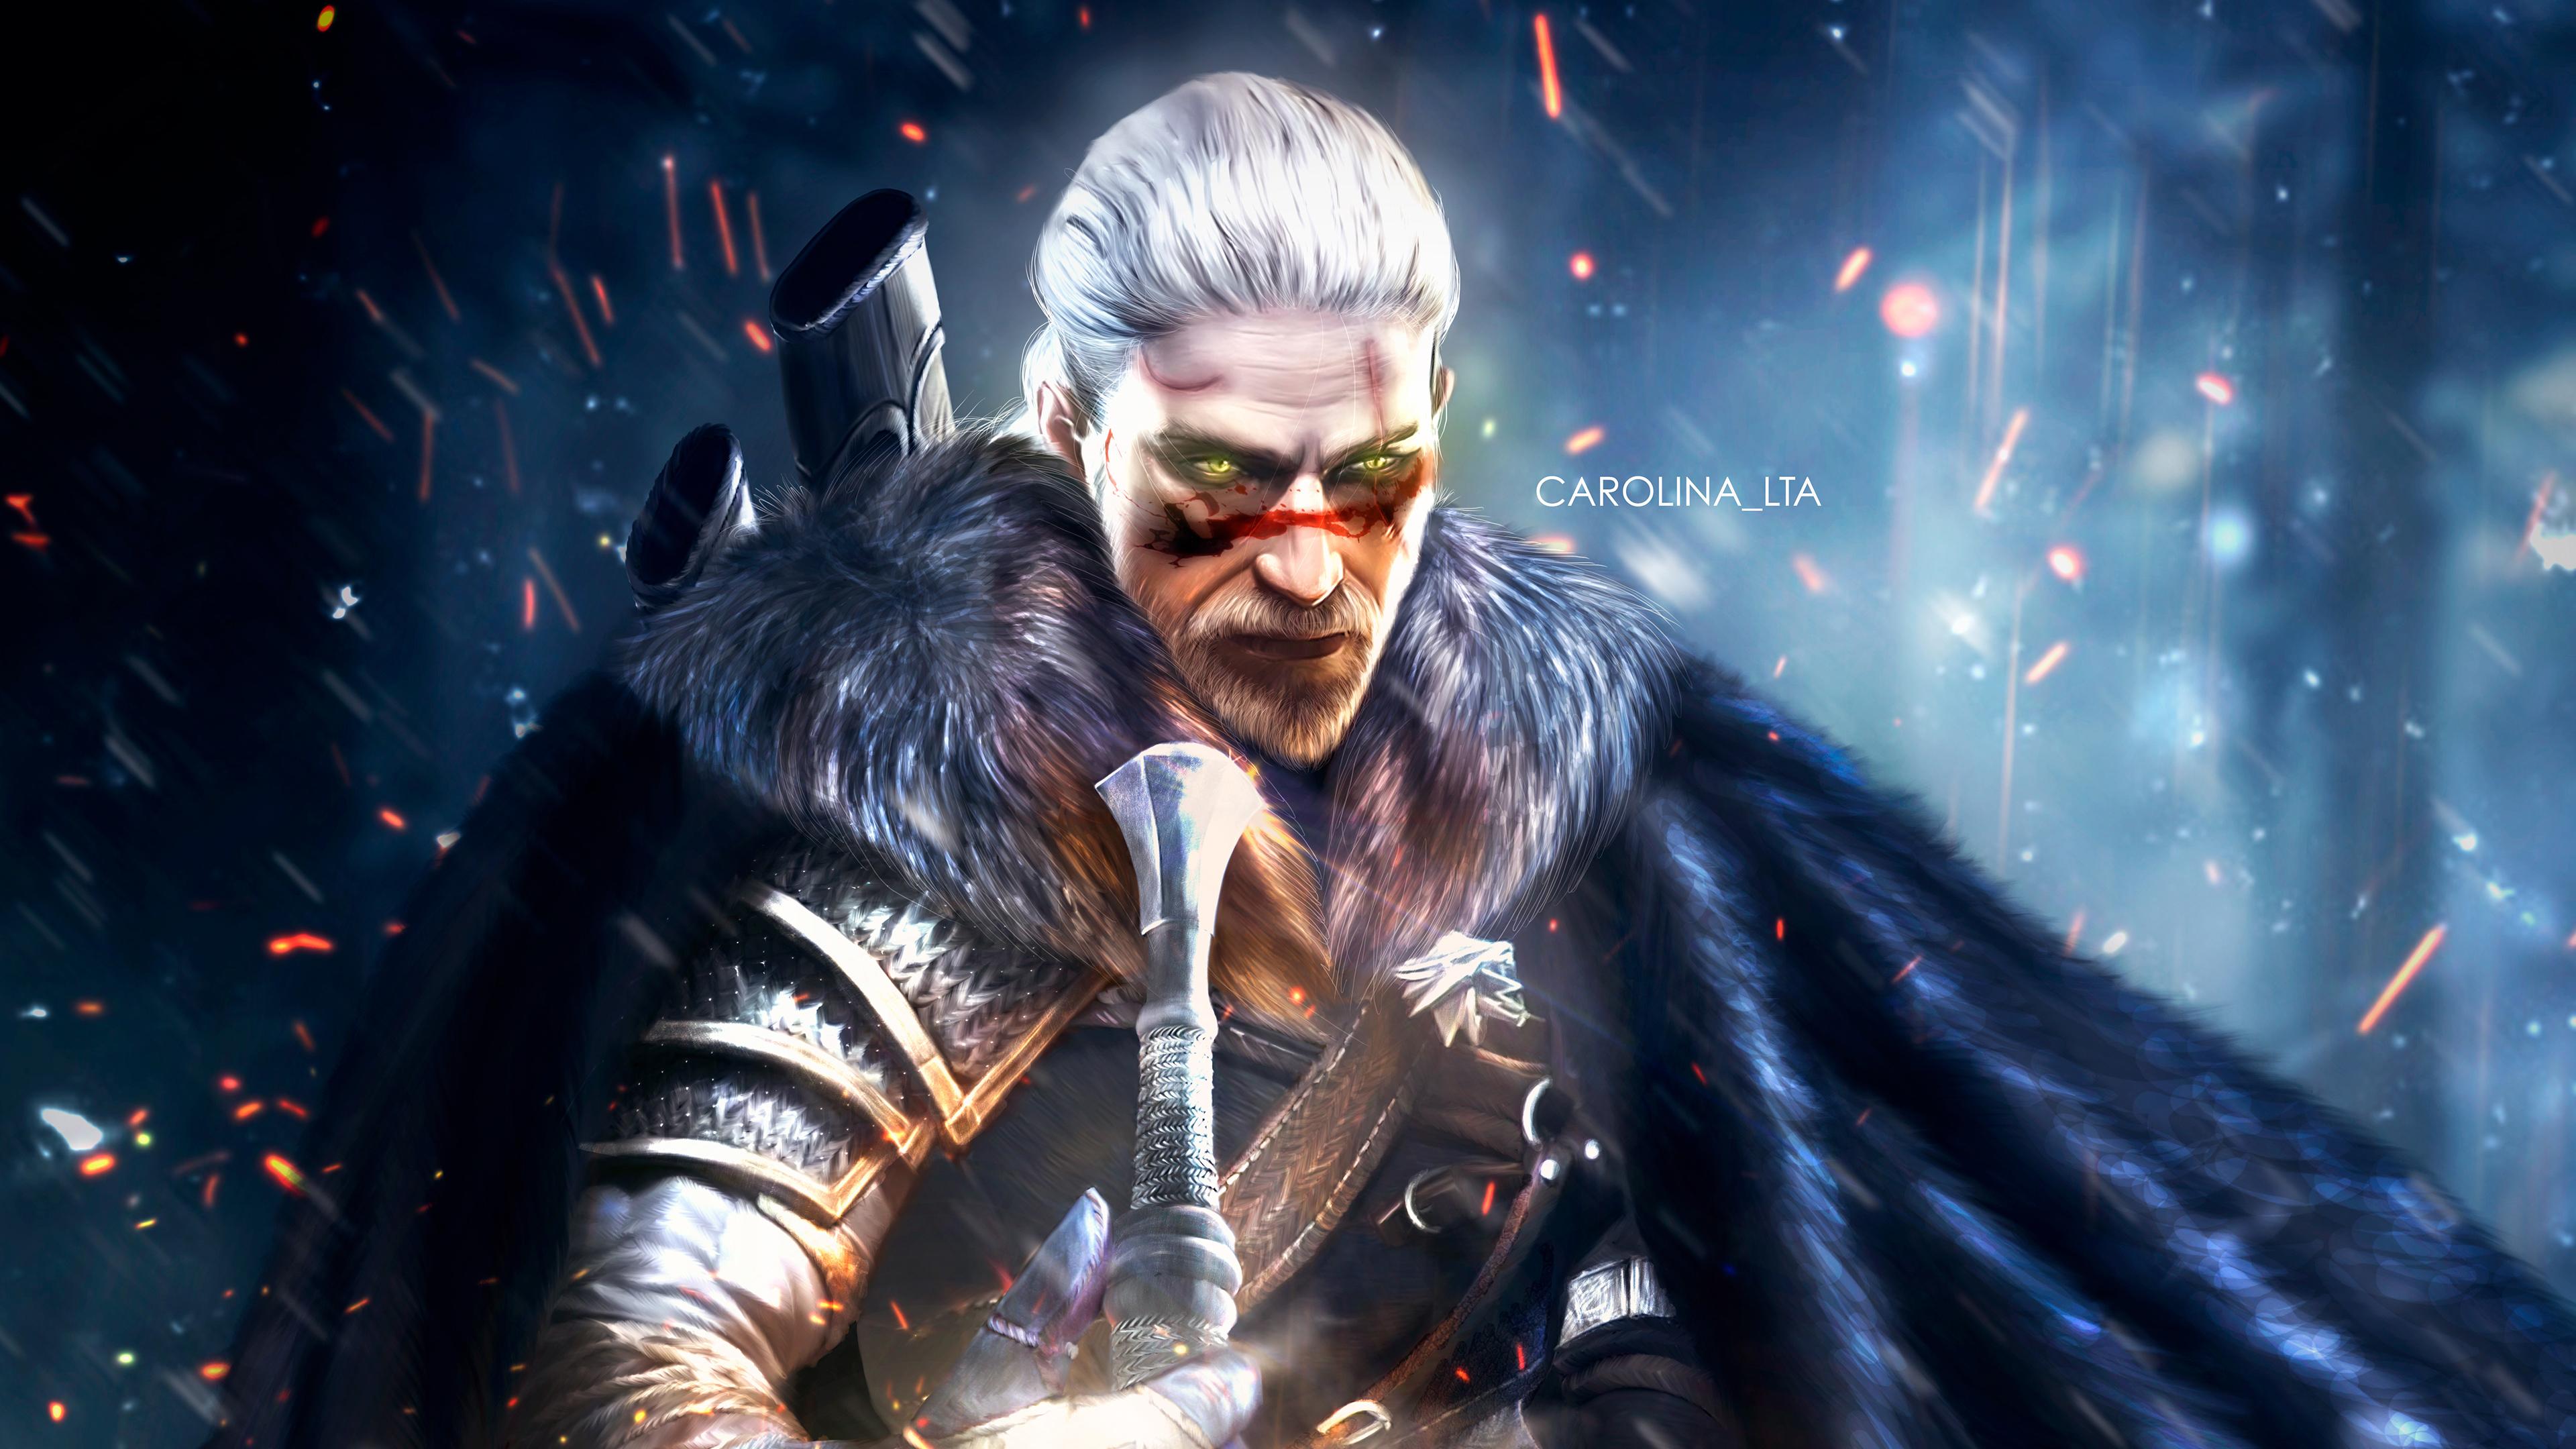 Geralt Of Rivia 4k Hd Games 4k Wallpapers Images